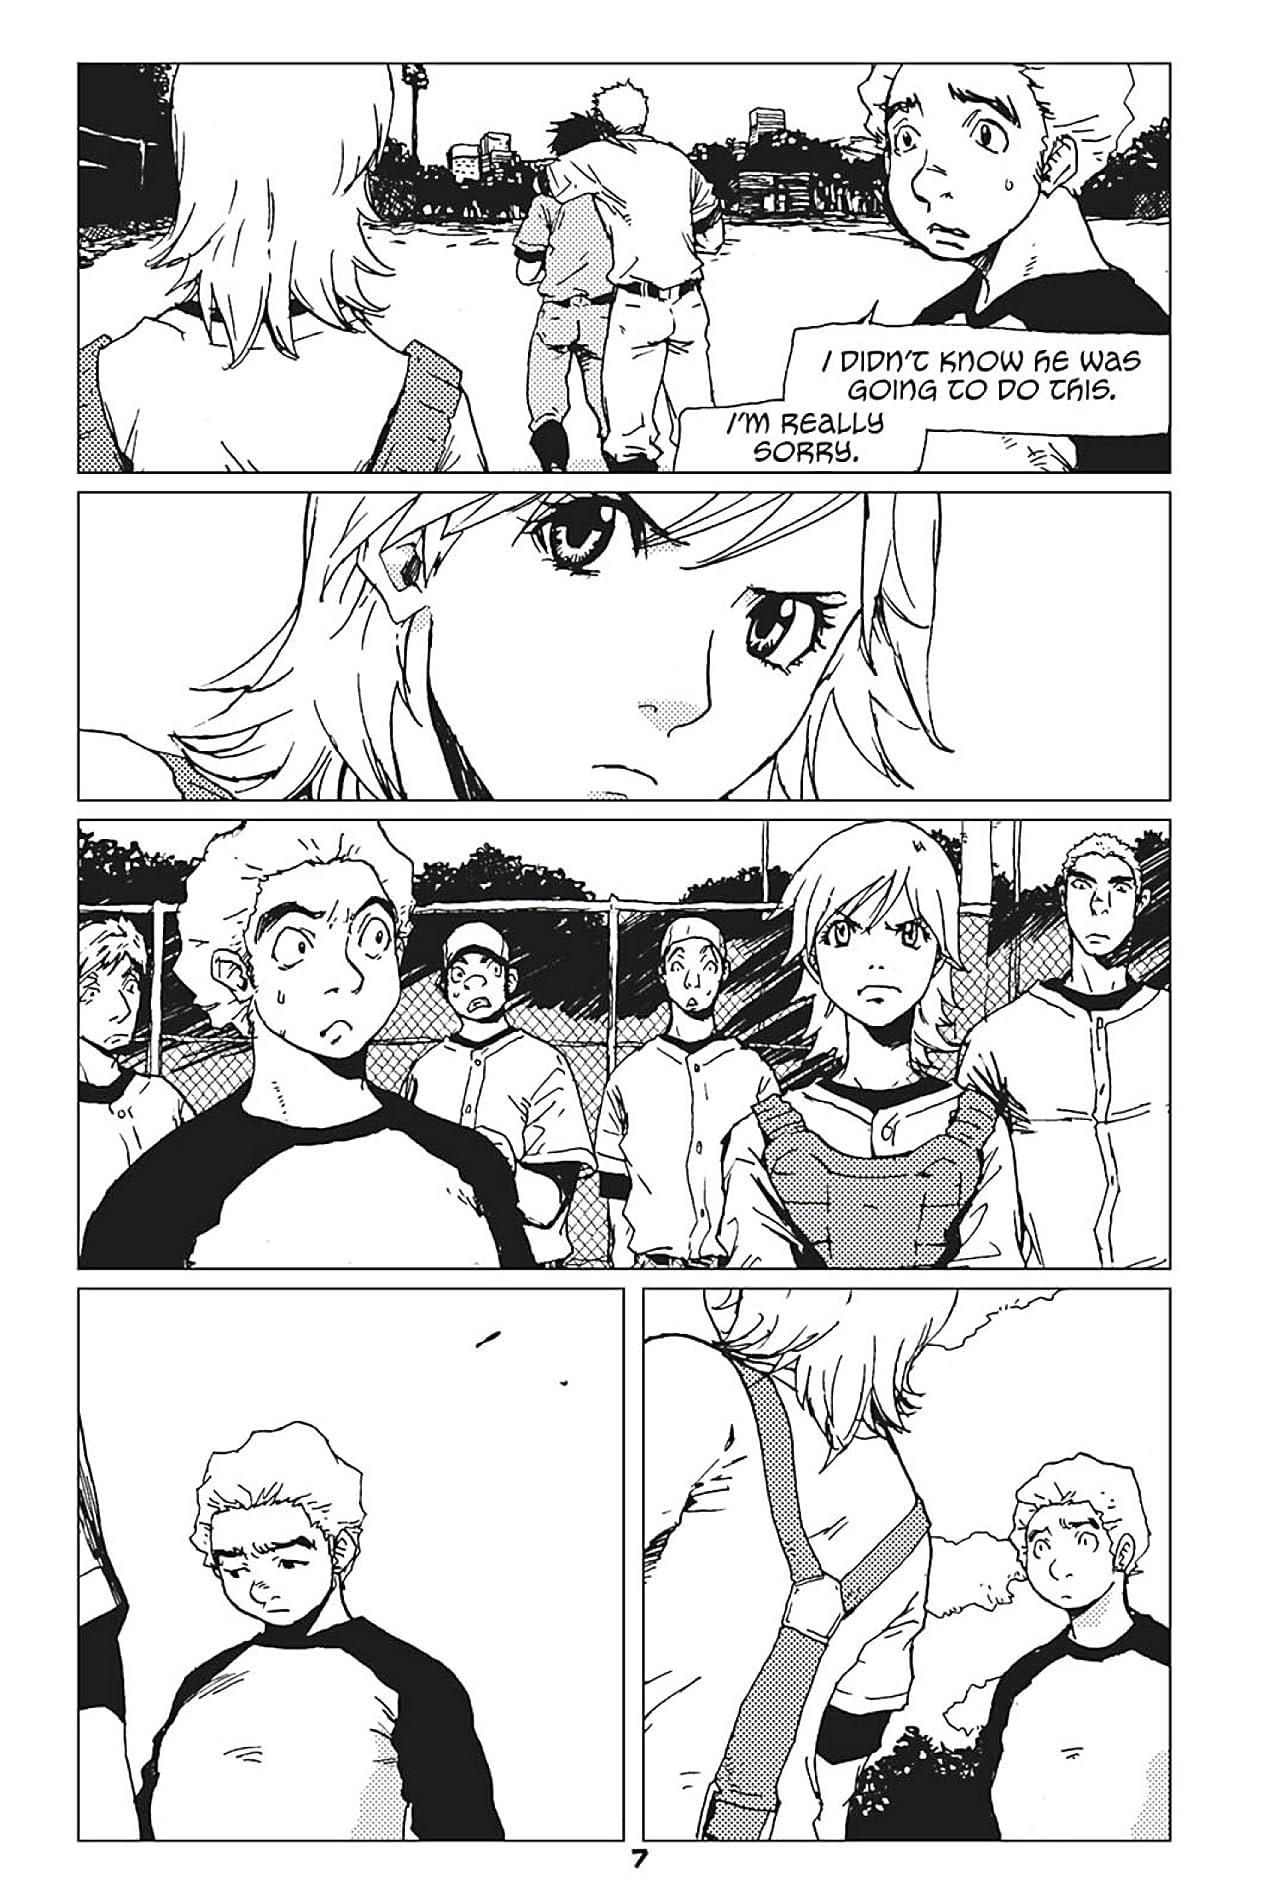 Boys of Summer manga Vol. 2